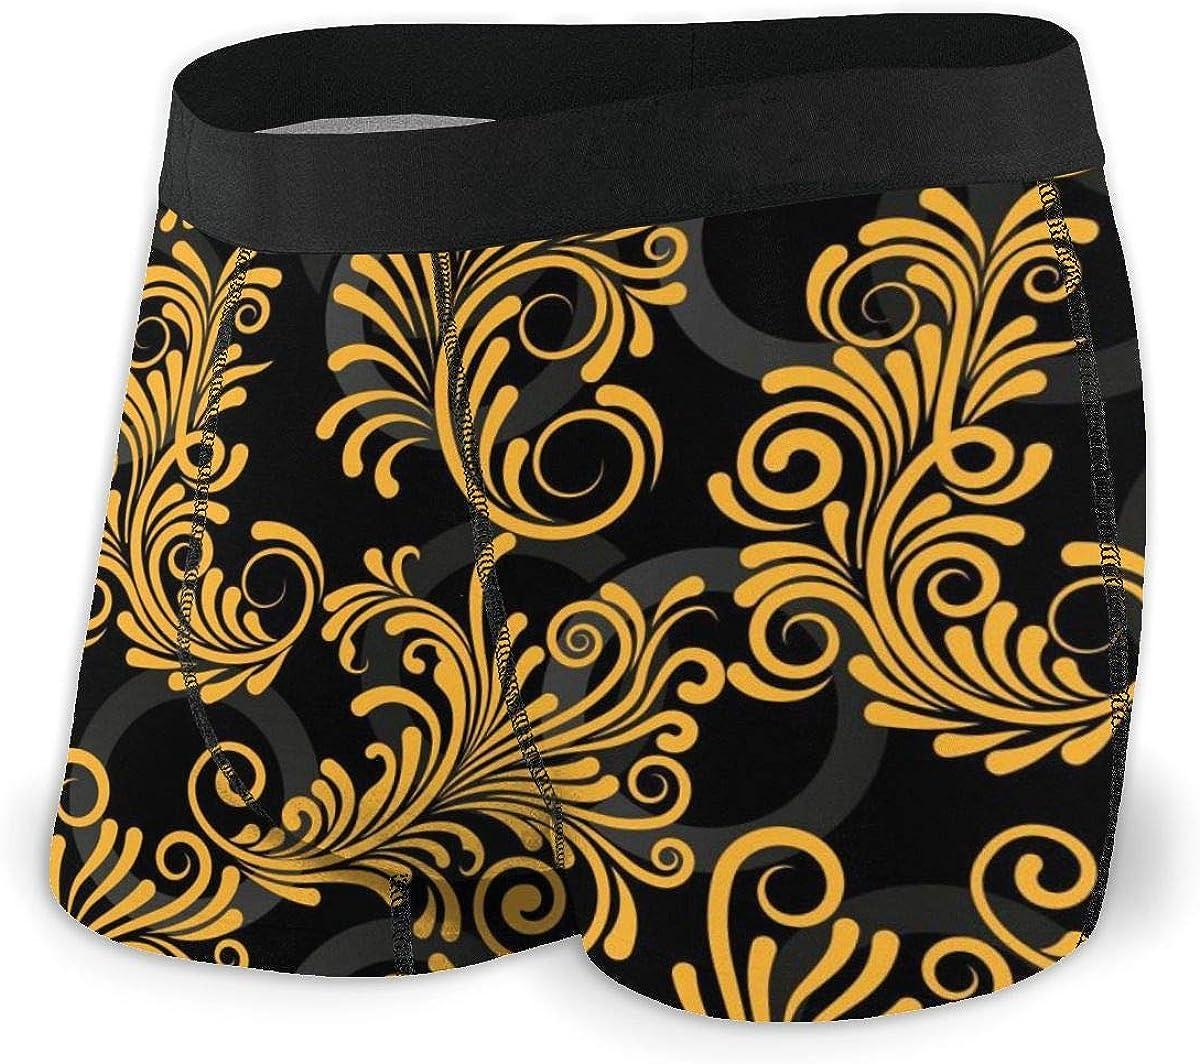 Mens Boxer Briefs Endless Abstract Golden Lines Boys Trunks Underwear Short Leg Breathable Man